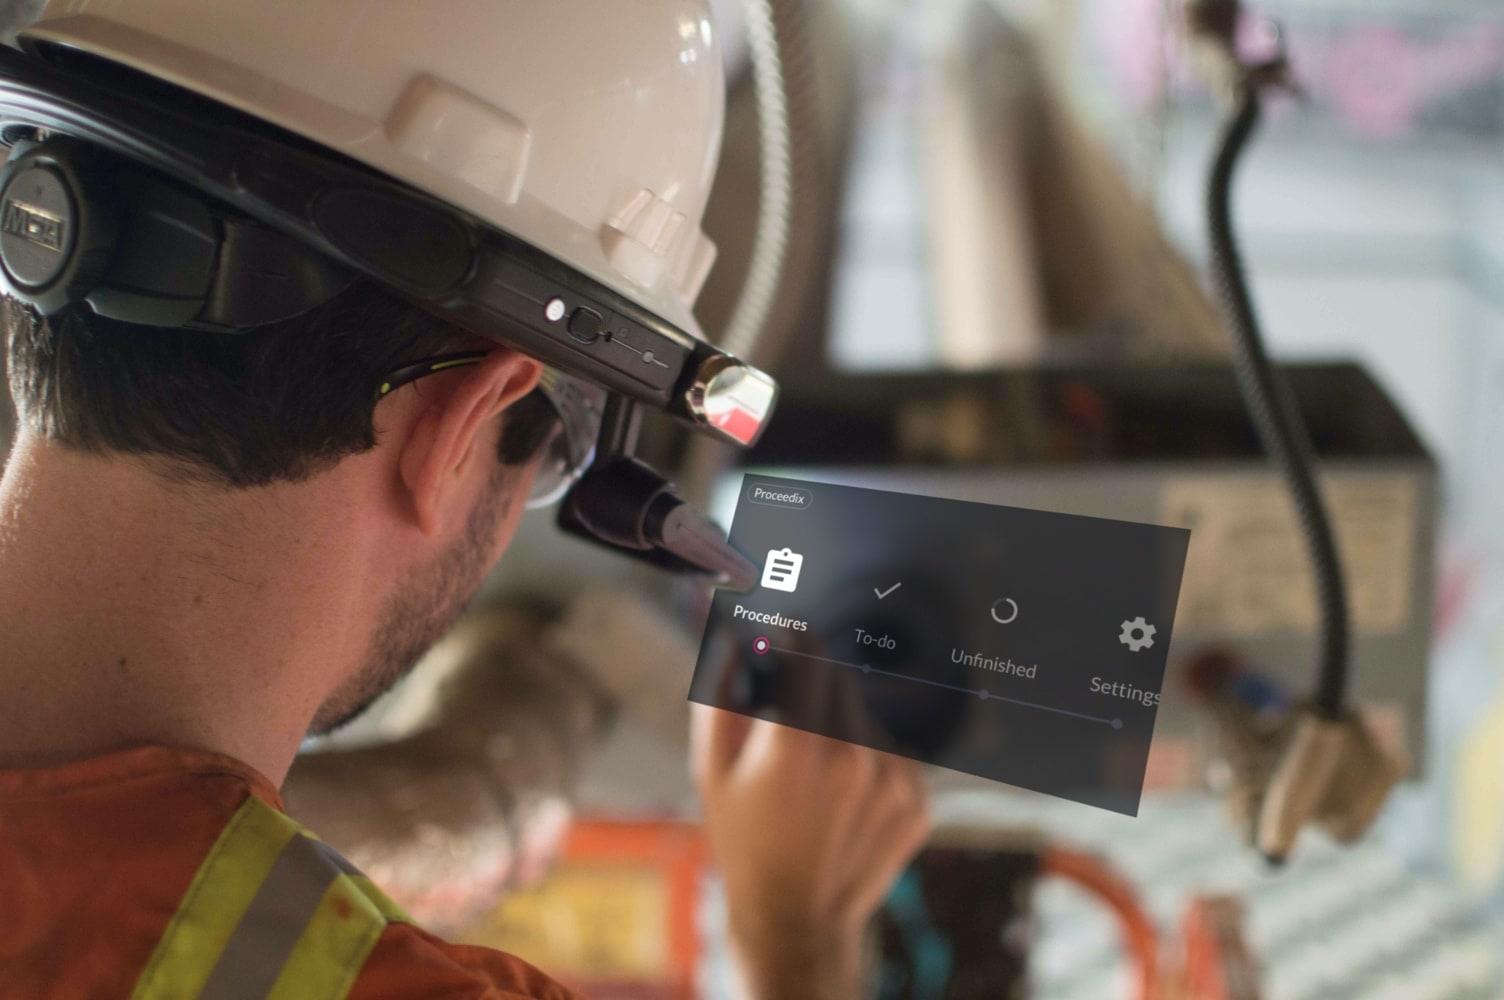 The Proceedix app running on a voice controlled smart helmet.